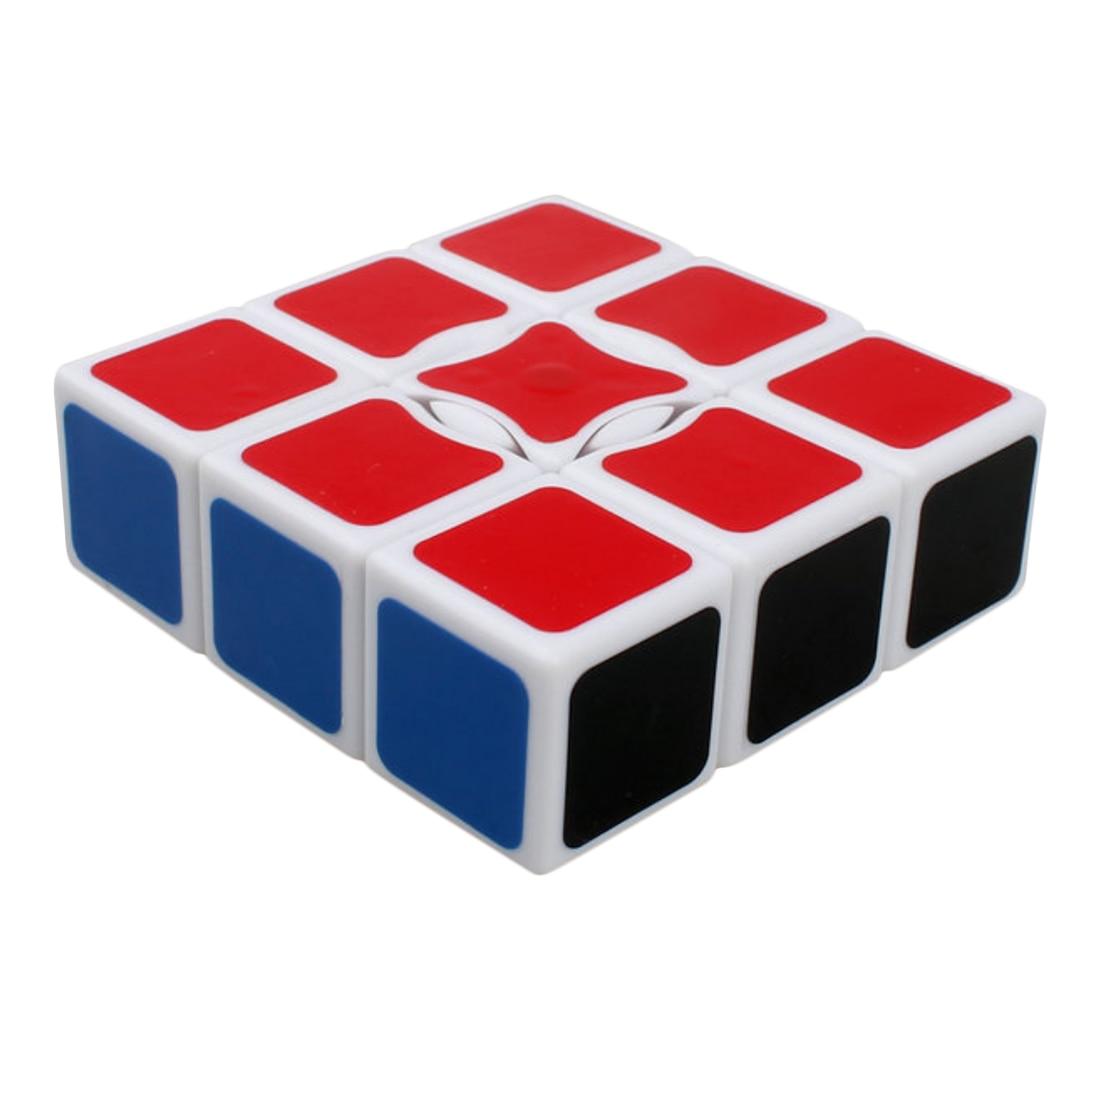 Magic Cubes X-cube 1x3x3 Floppy Magic Cube Puzzle Brain Teaser Quell Summer Thirst Puzzles & Games